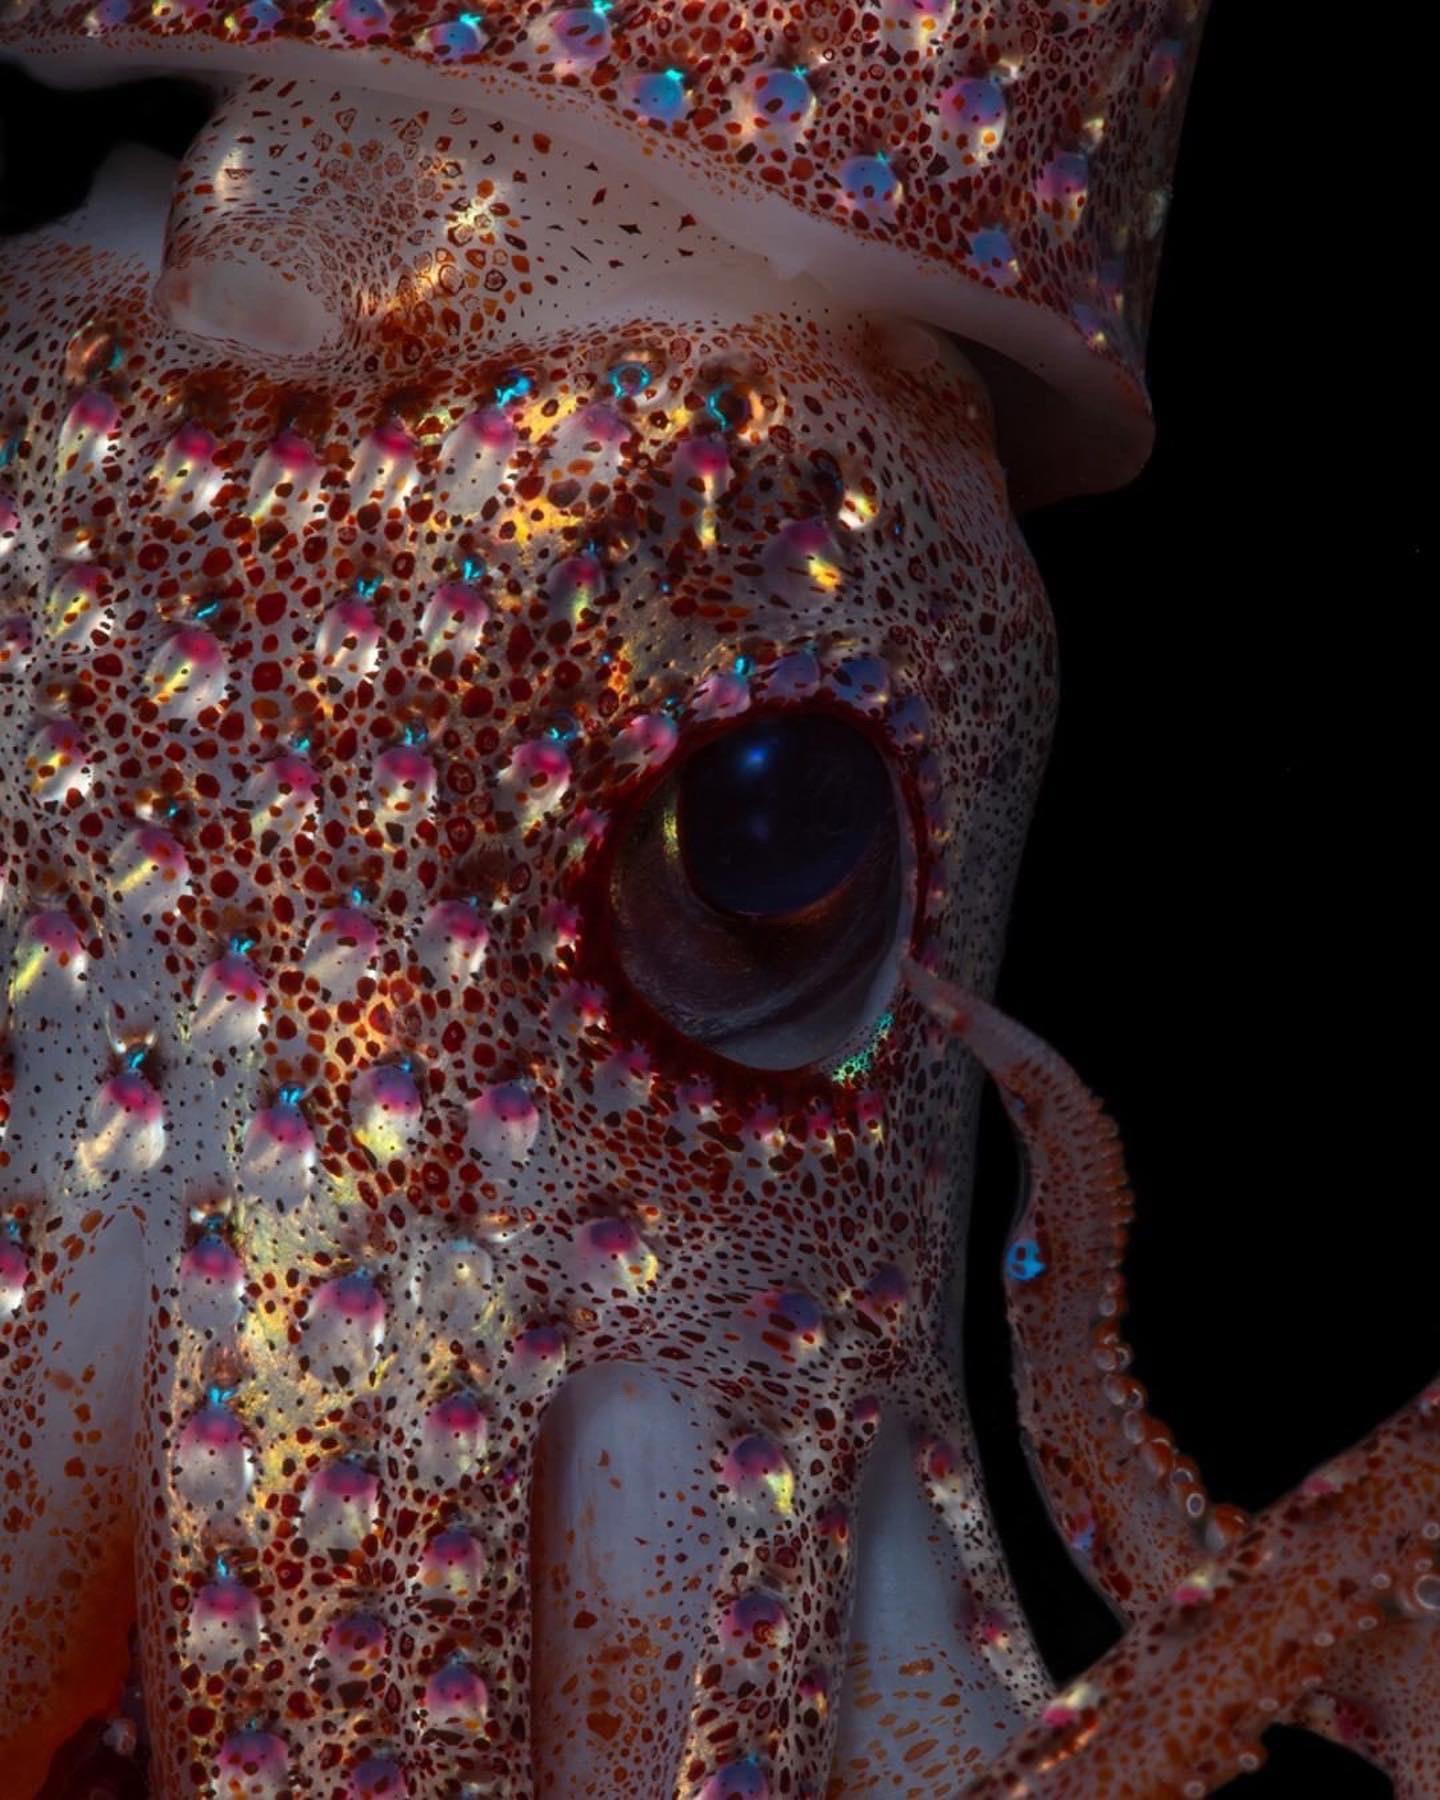 🔥 A strawberry Squid : NatureIsFuckingLit